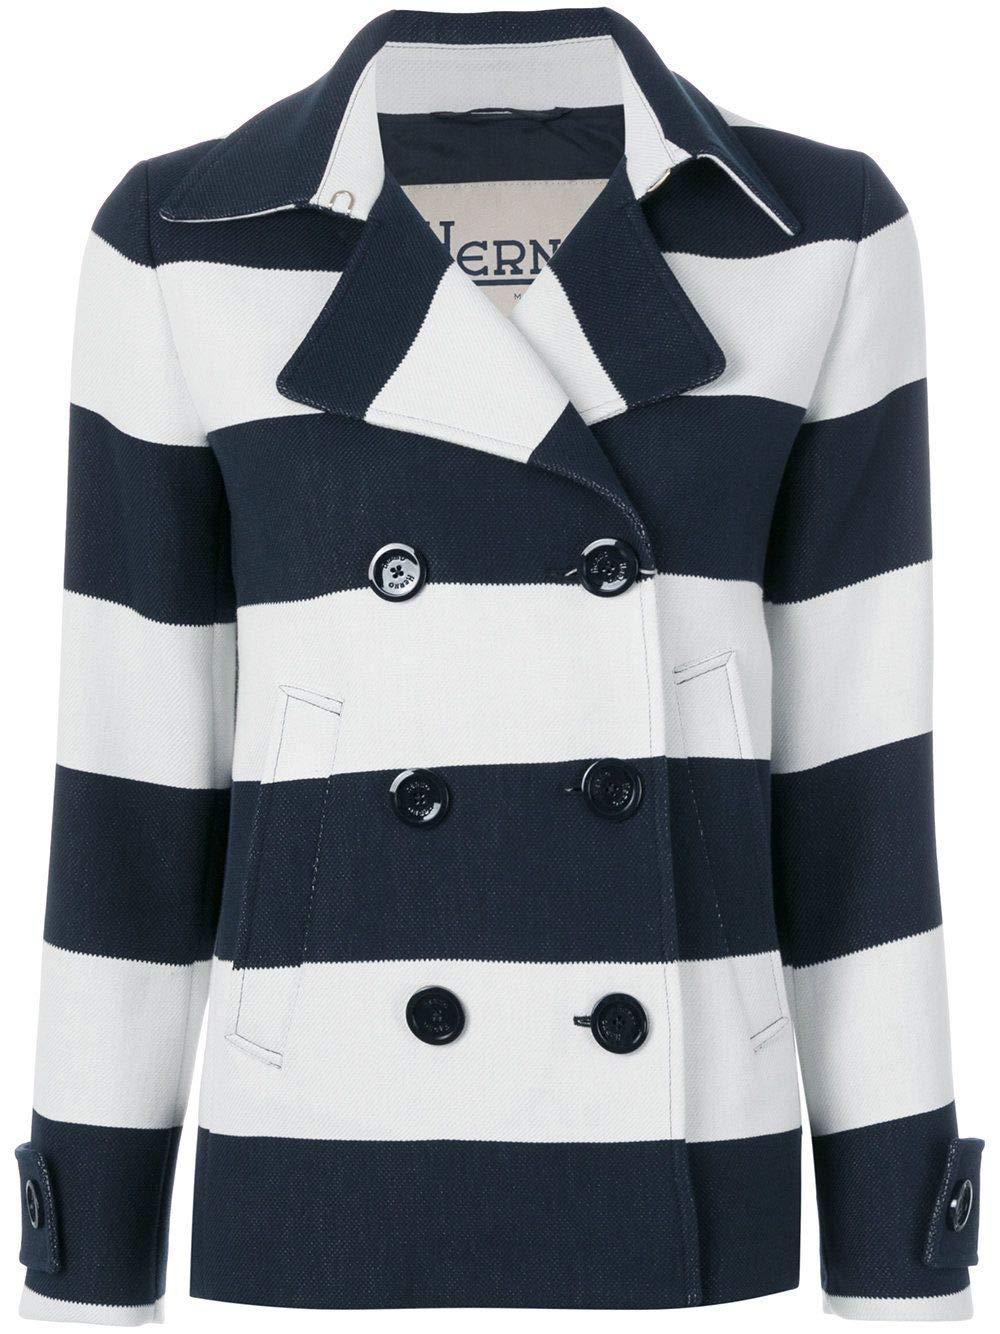 Herno Women's GA0129D138101092 bluee Cotton Outerwear Jacket